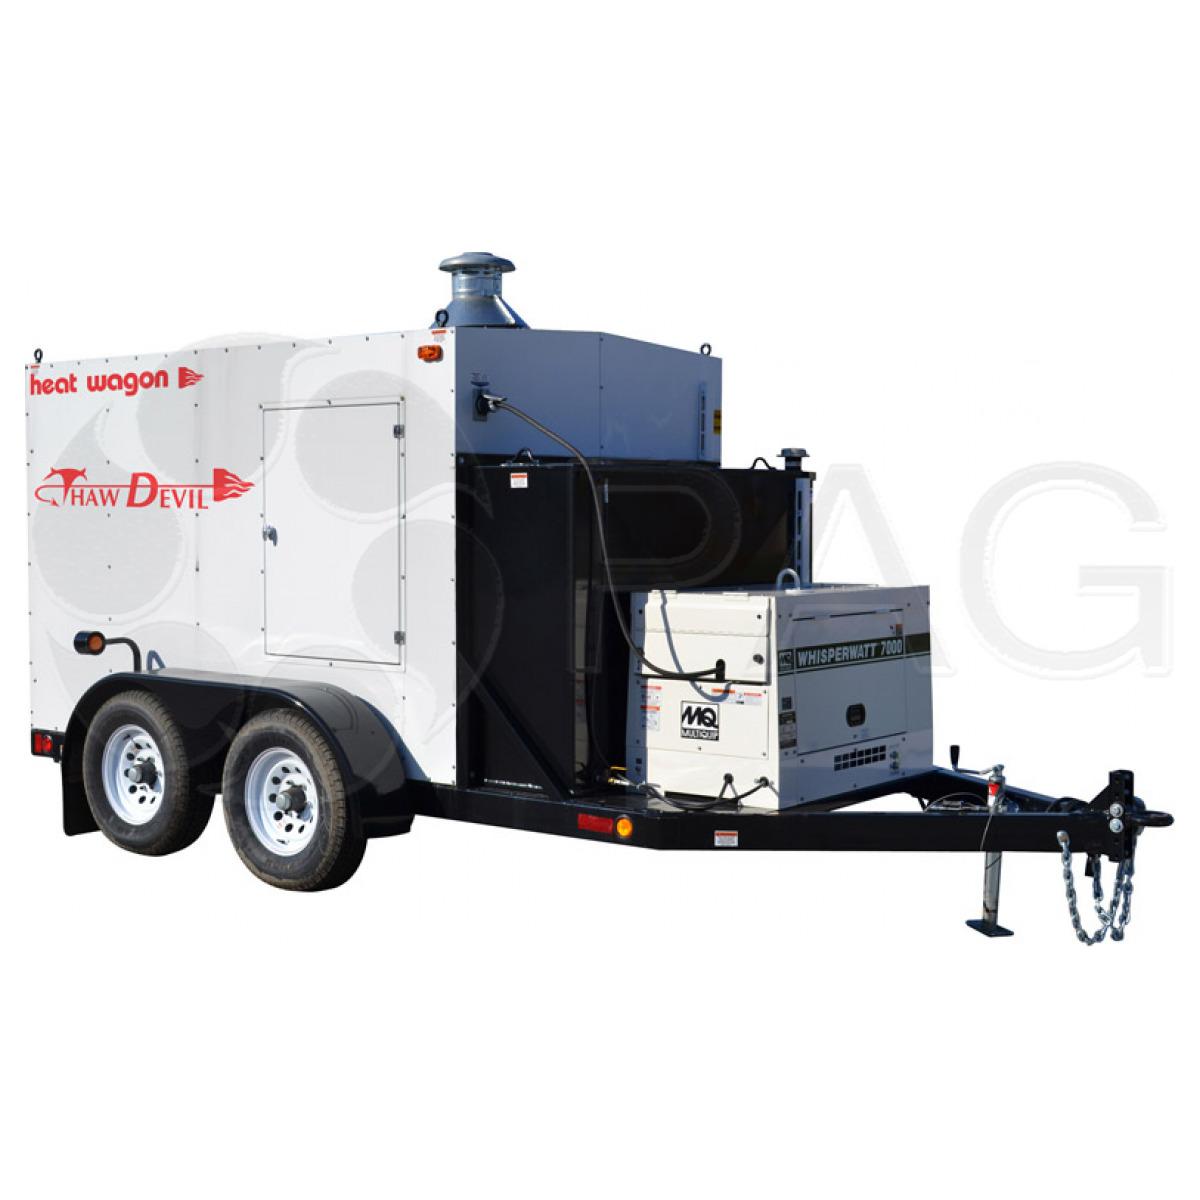 Heat Wagon ground thawing heater TD600